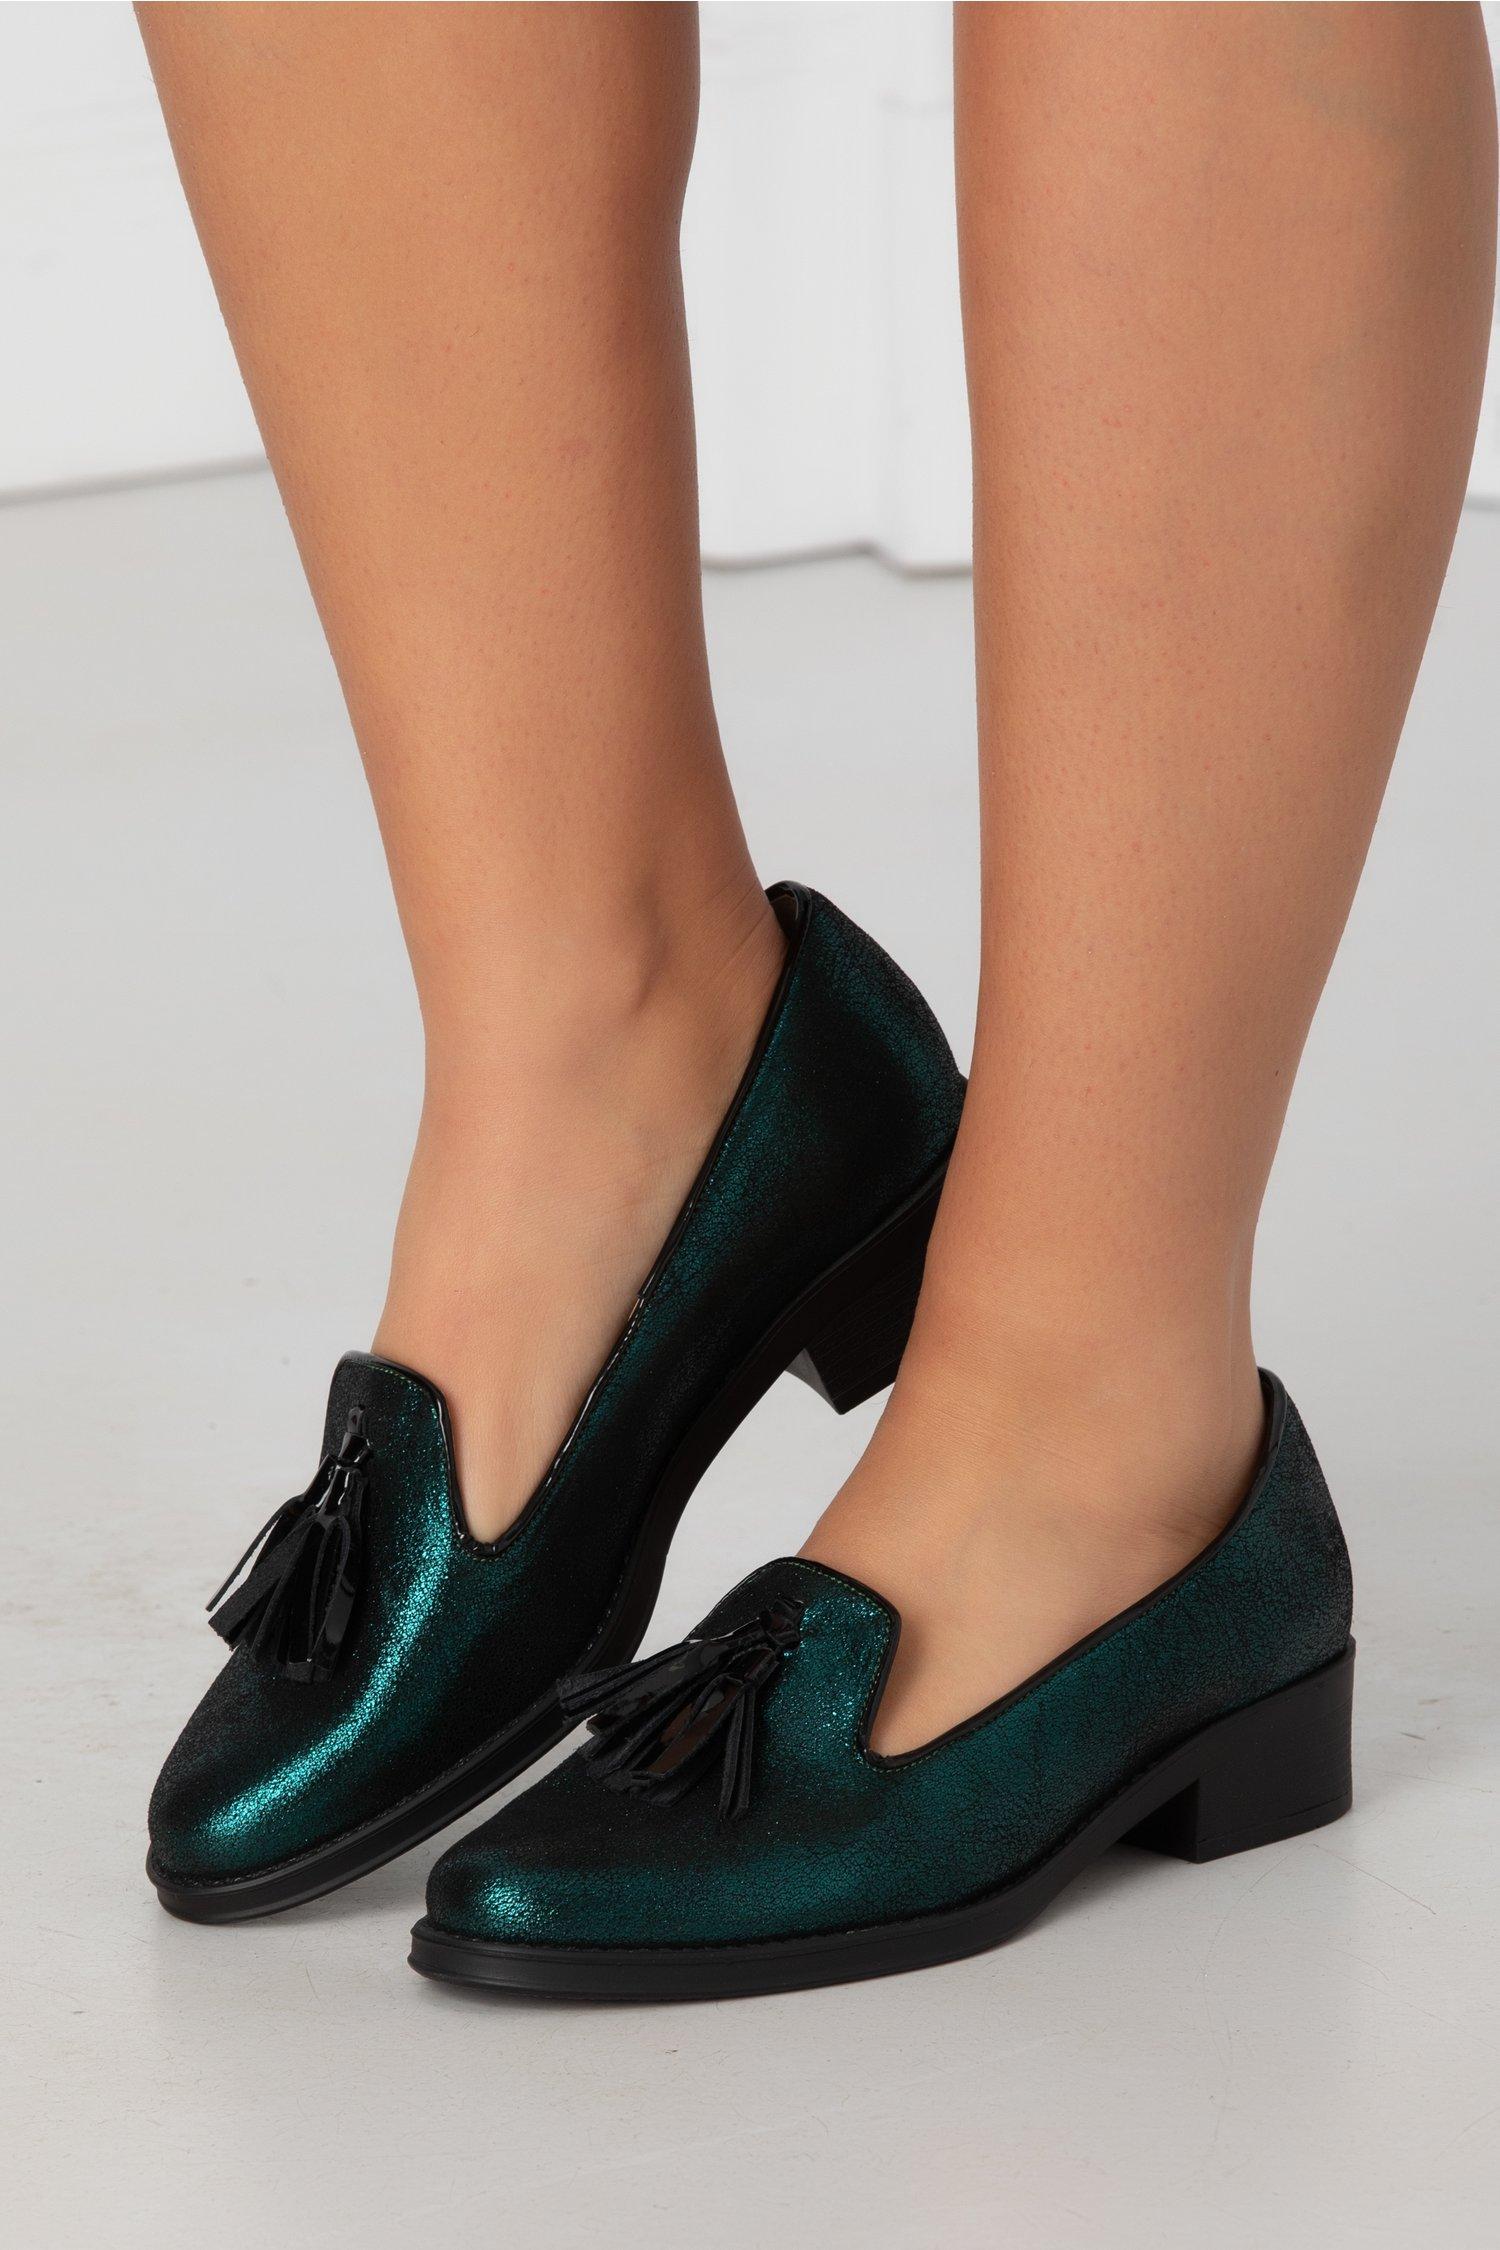 Pantofi verde metalizat cu talpa joasa si ciucure